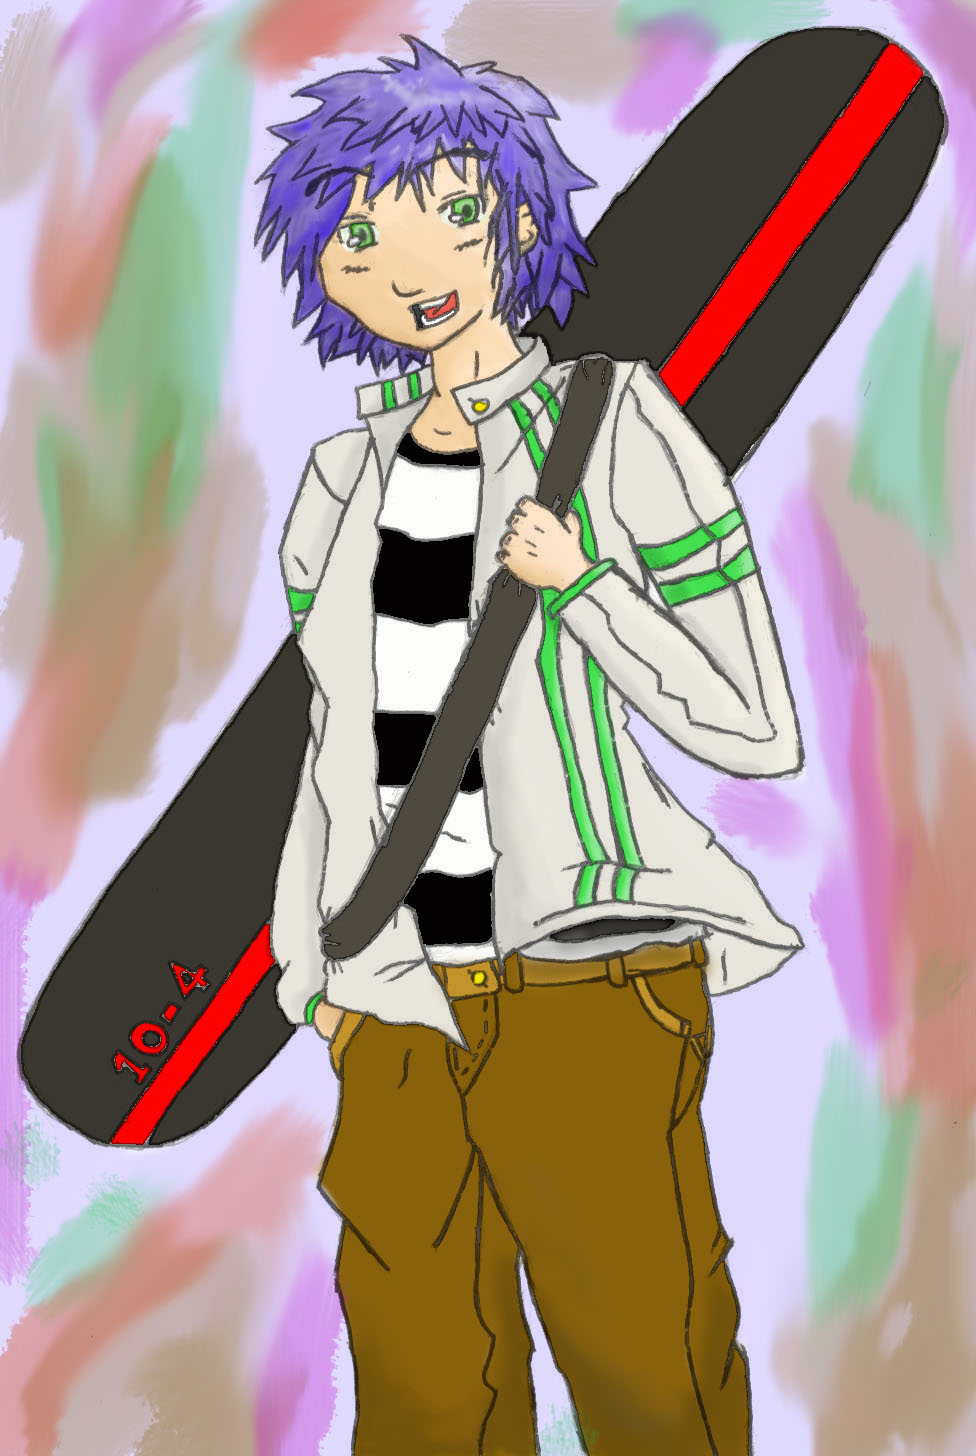 Snowboarder Sota